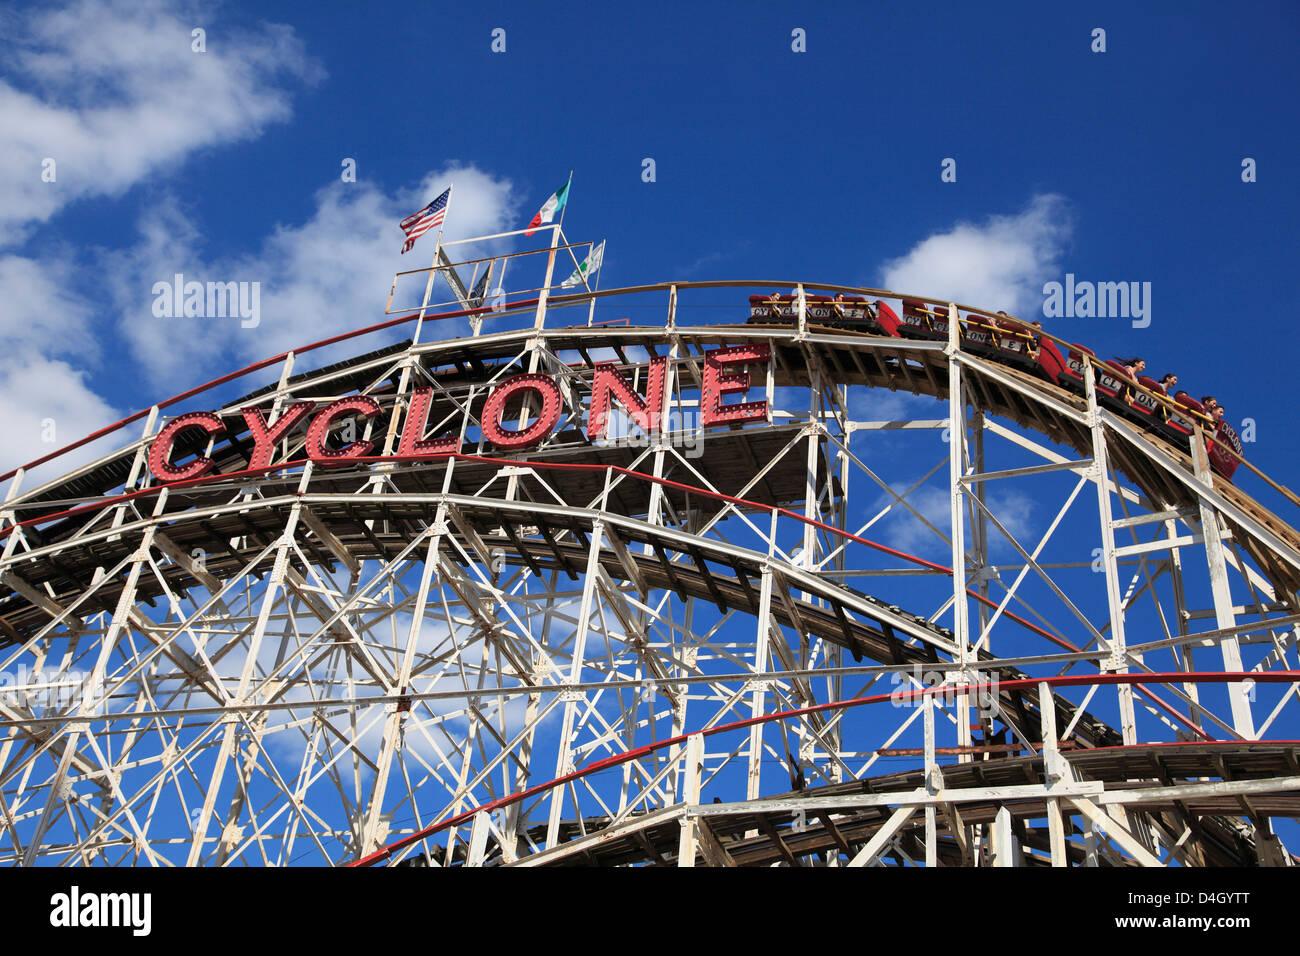 Cyclone roller coaster, Coney Island, Brooklyn, New York City, USA - Stock Image